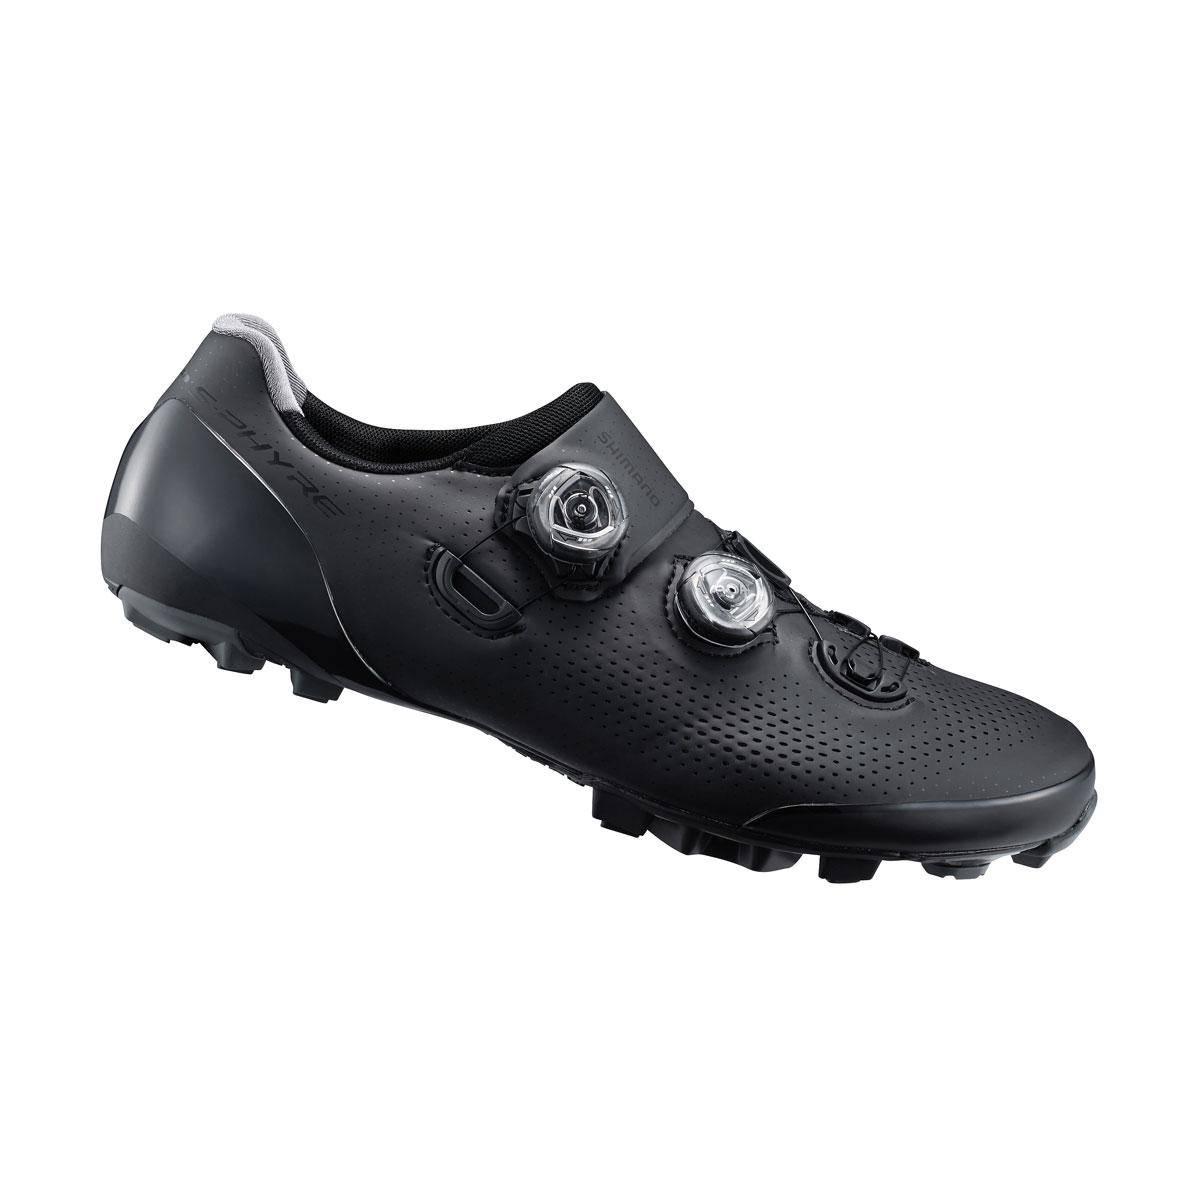 SHIMANO MTB obuv SH-XC901ML, černá, 42